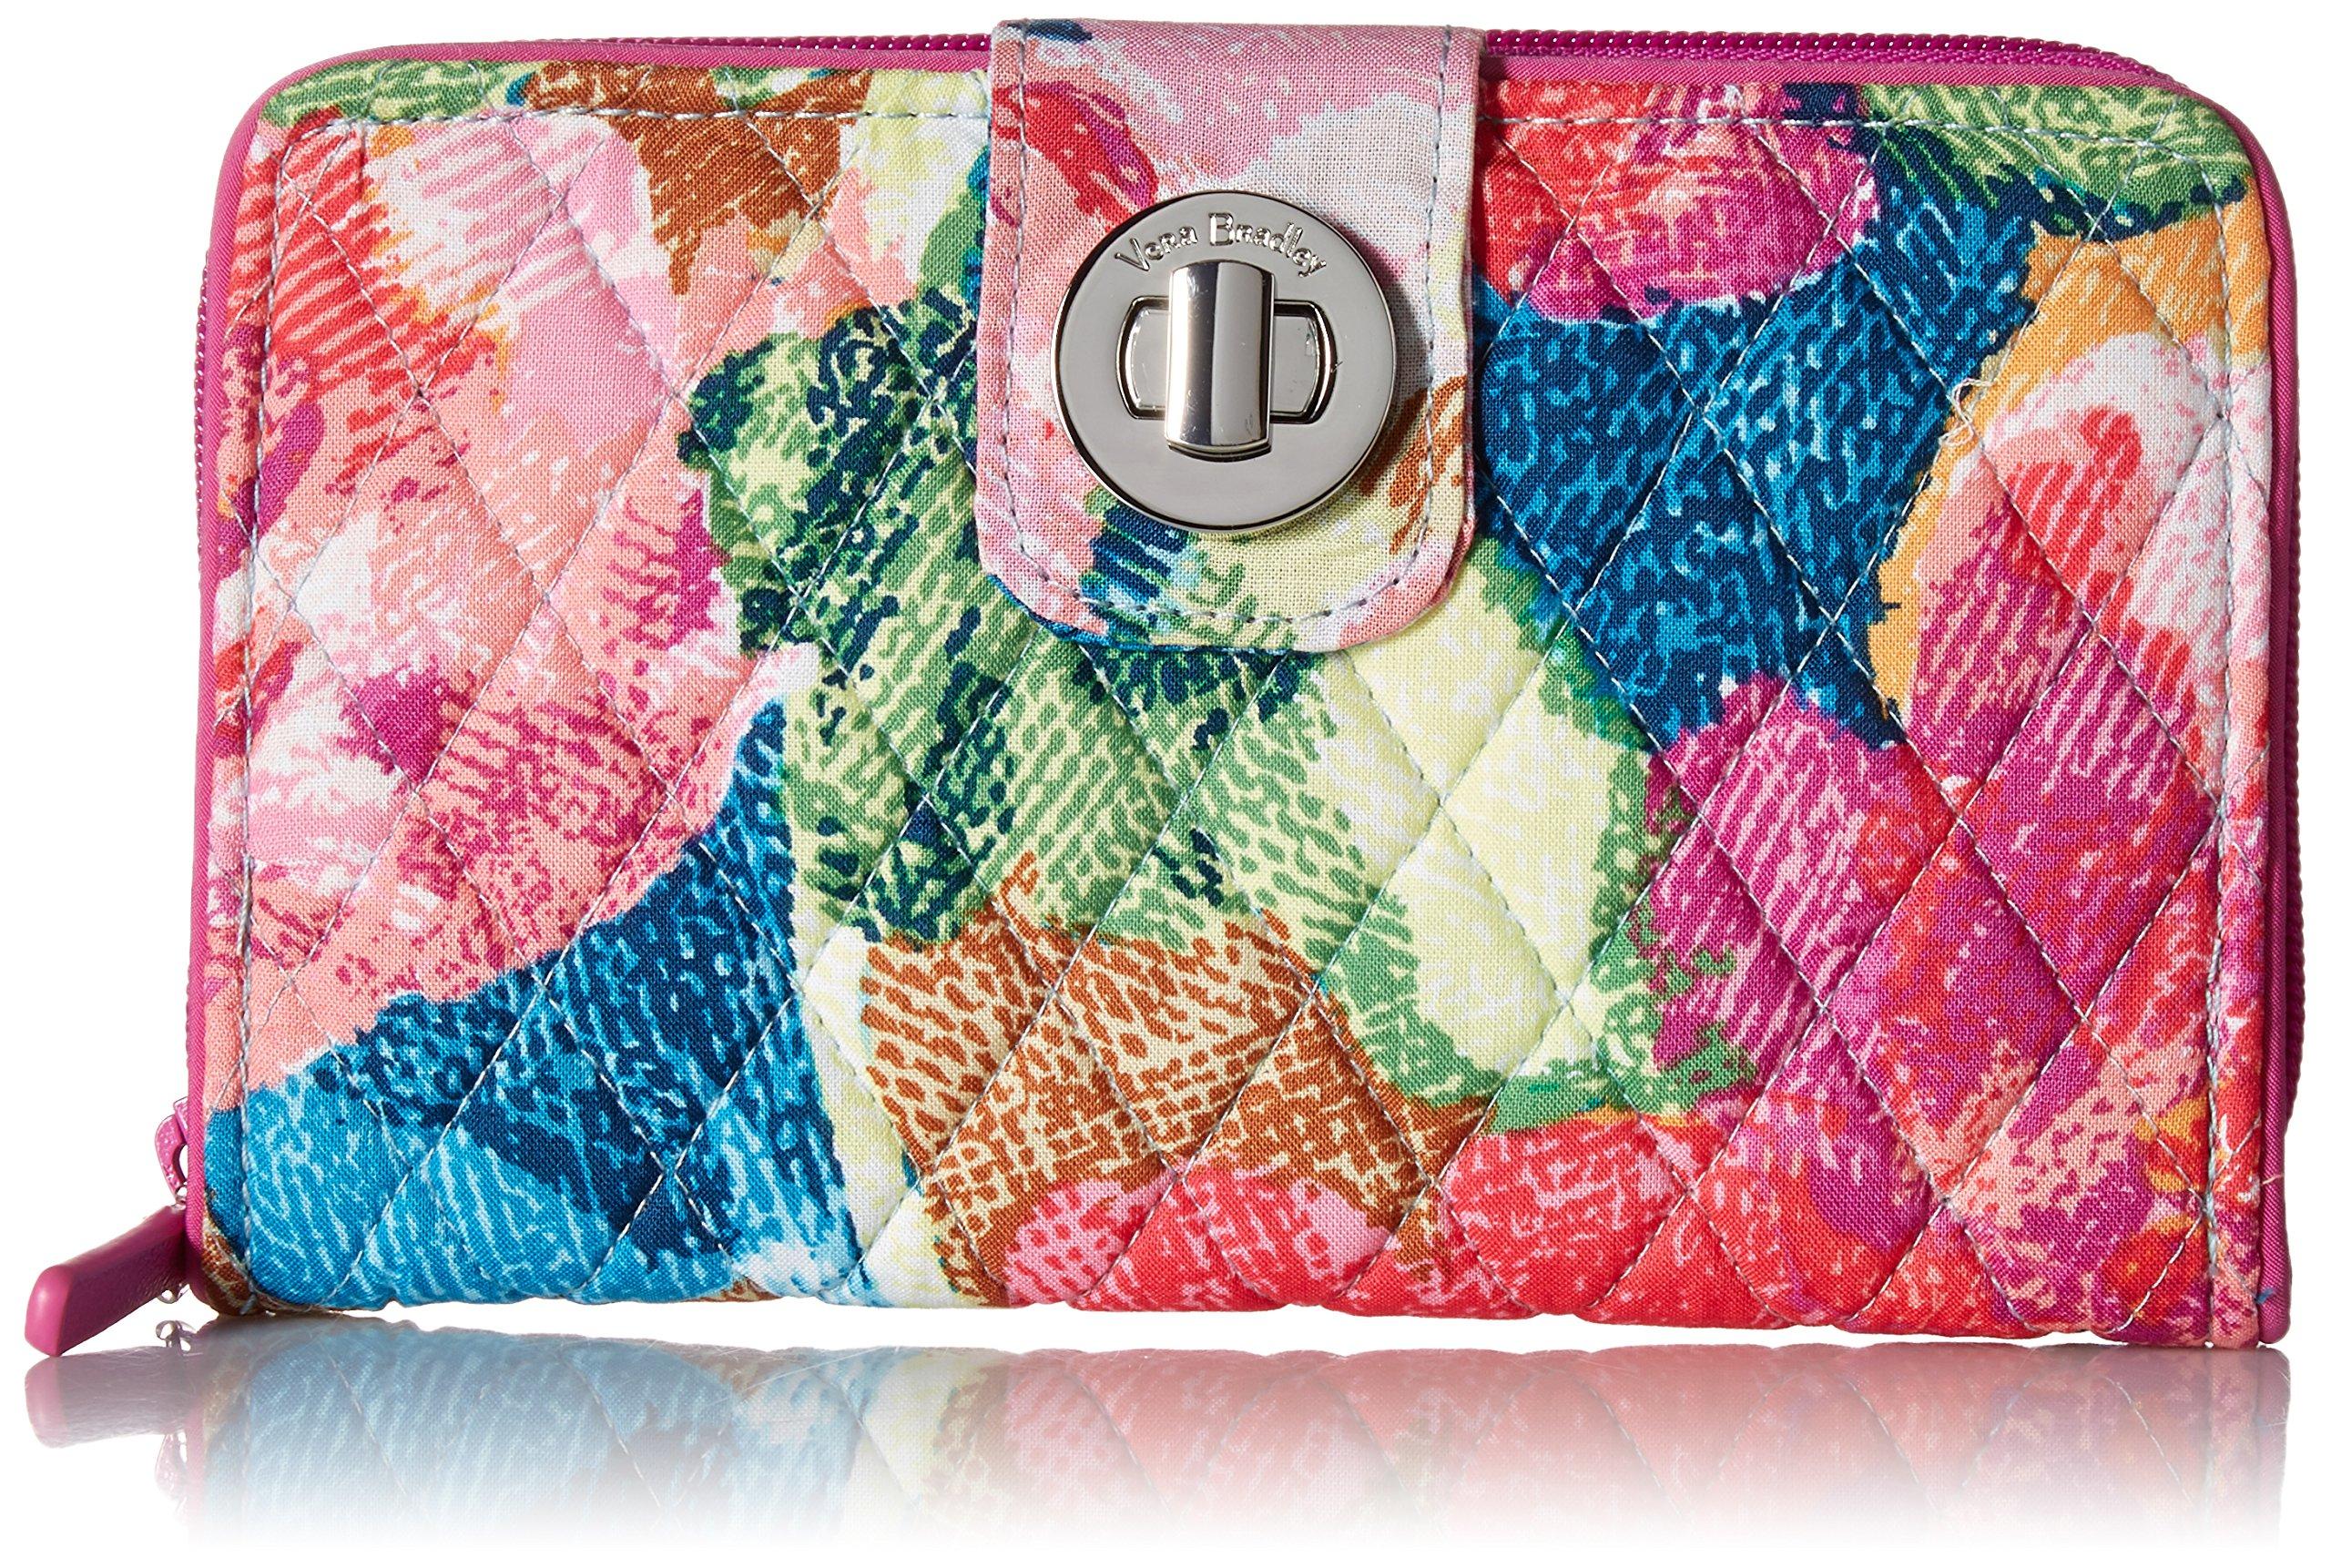 Vera Bradley RFID Turnlock Wallet, Signature Cotton, Superbloom